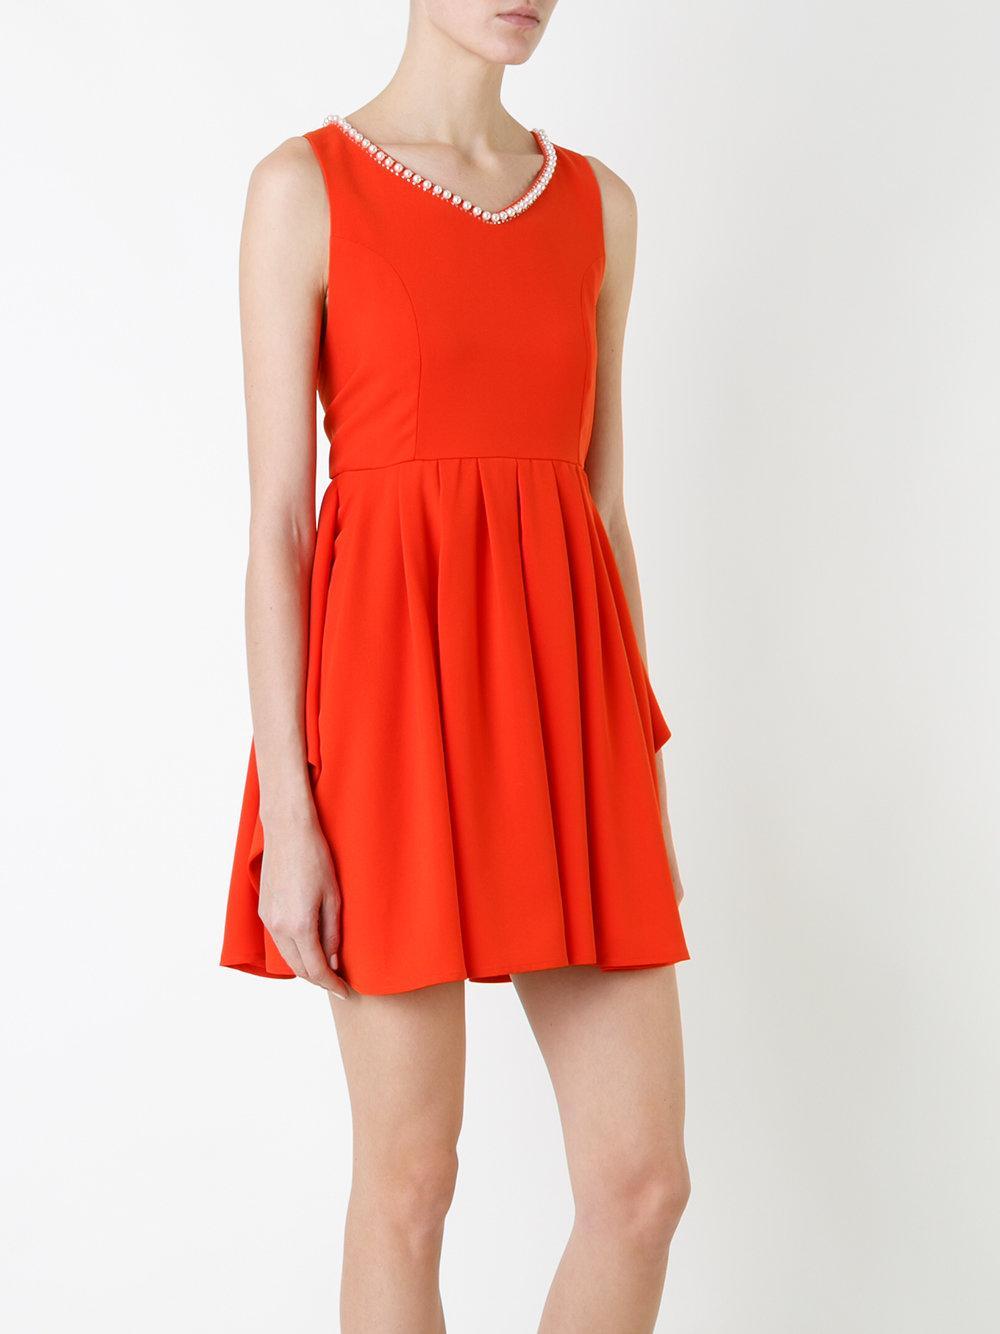 Loveless Pleated Trim Dress In Red Lyst